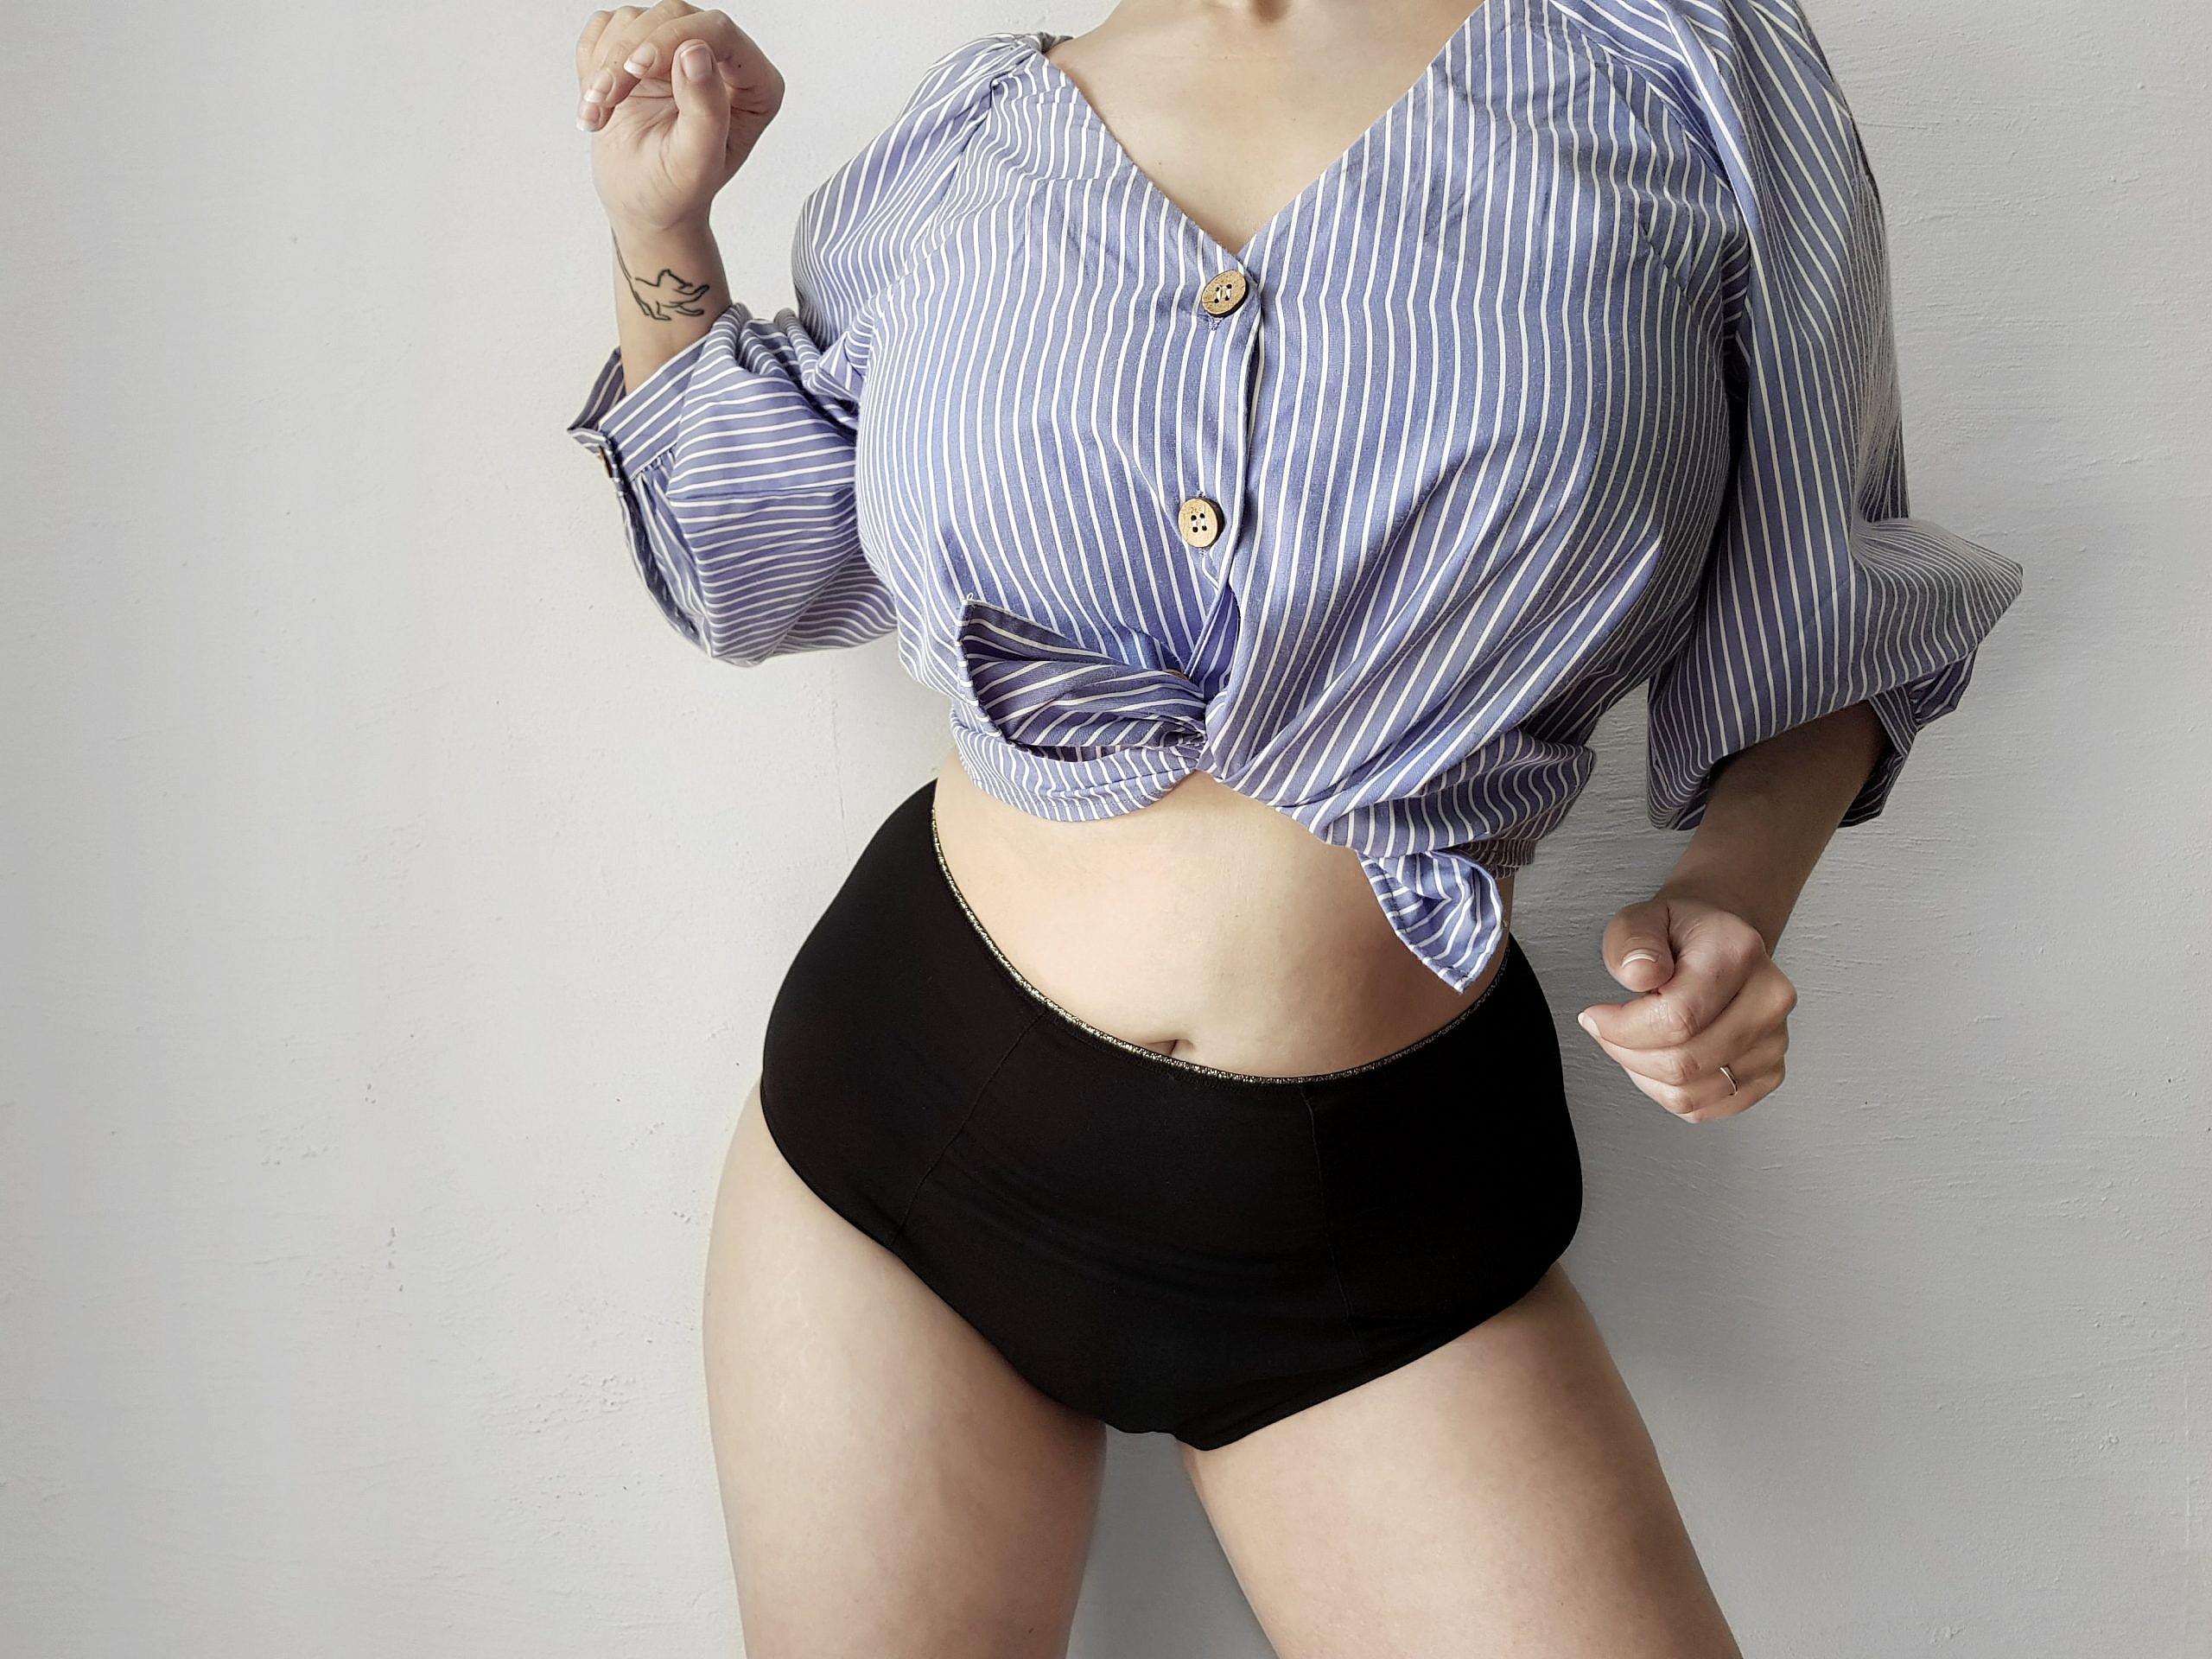 avis-moodz-culotte-menstruelle-taille-haute